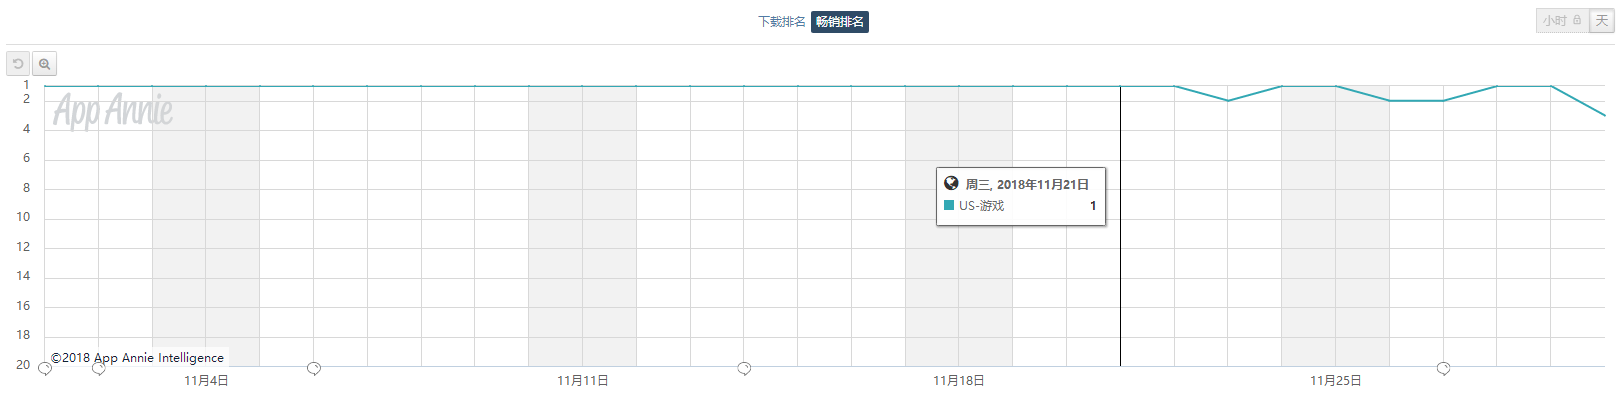 App Annie的统计显示,整个11月份,《堡垒之夜》有26天停留在美国iOS畅销榜榜首